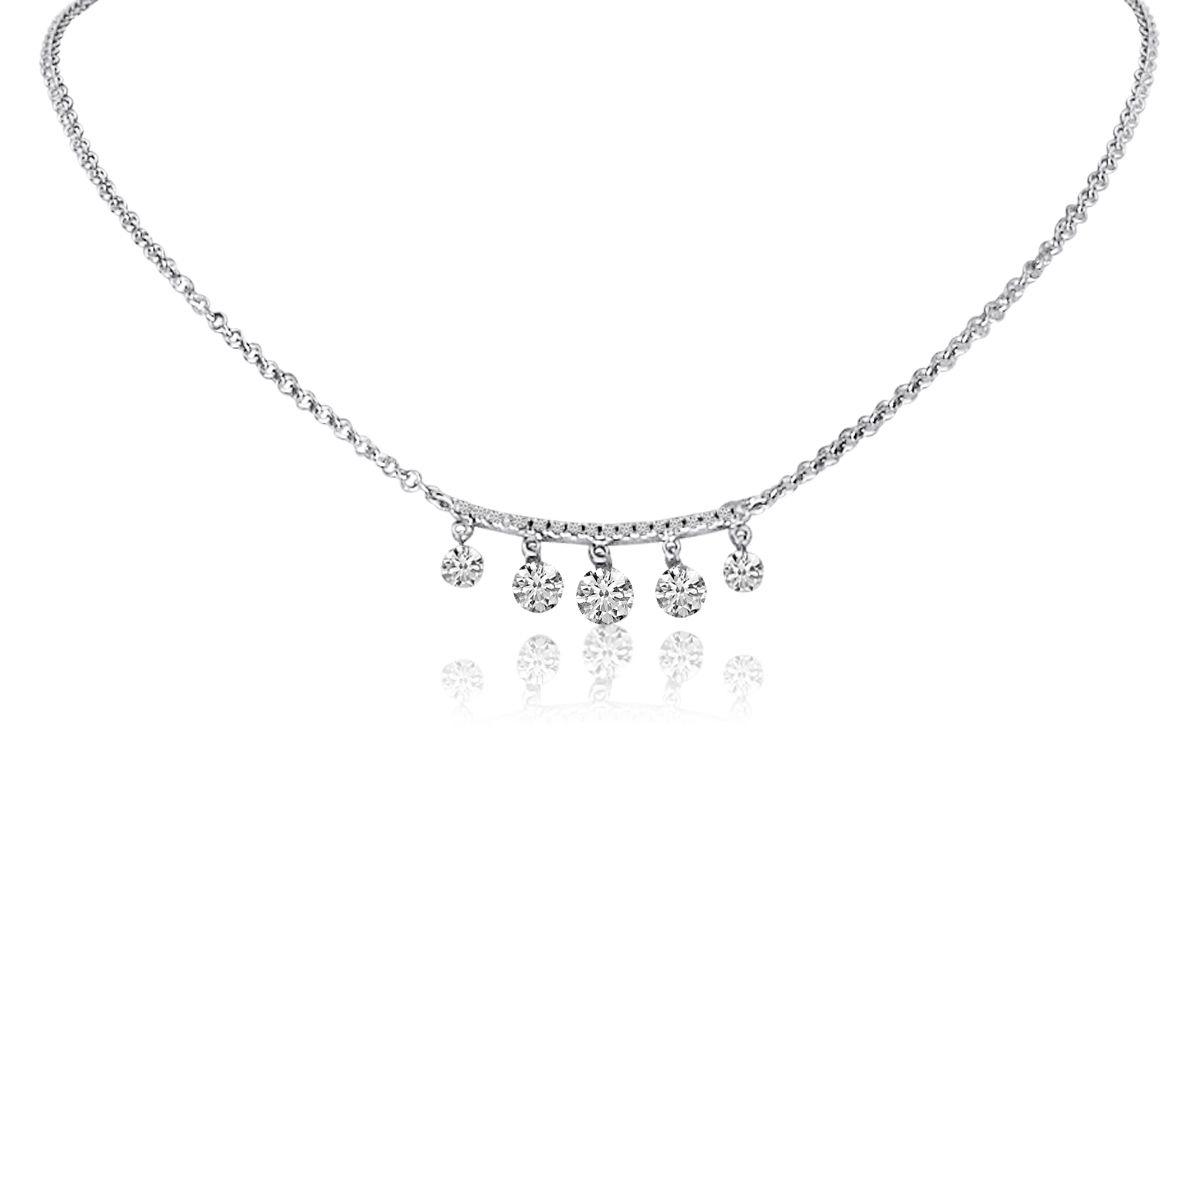 f51136380c681 Simply stunning! This 14K White Gold Five Pierced Dangling Dashing ...